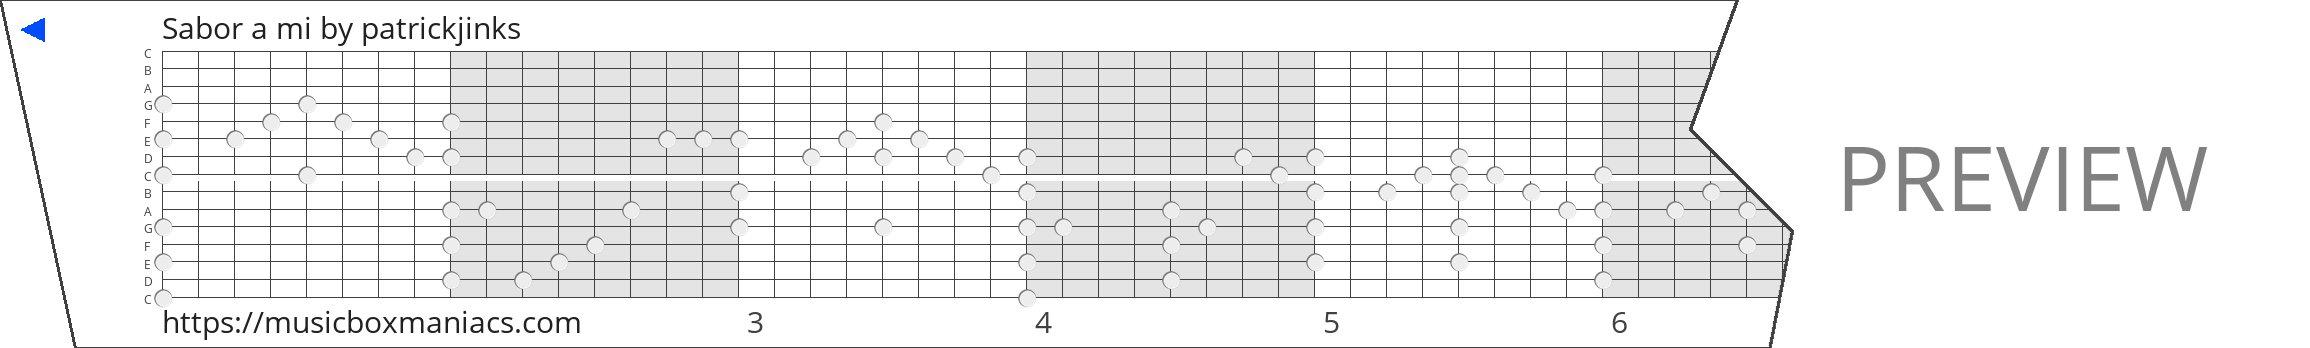 Sabor a mi 15 note music box paper strip